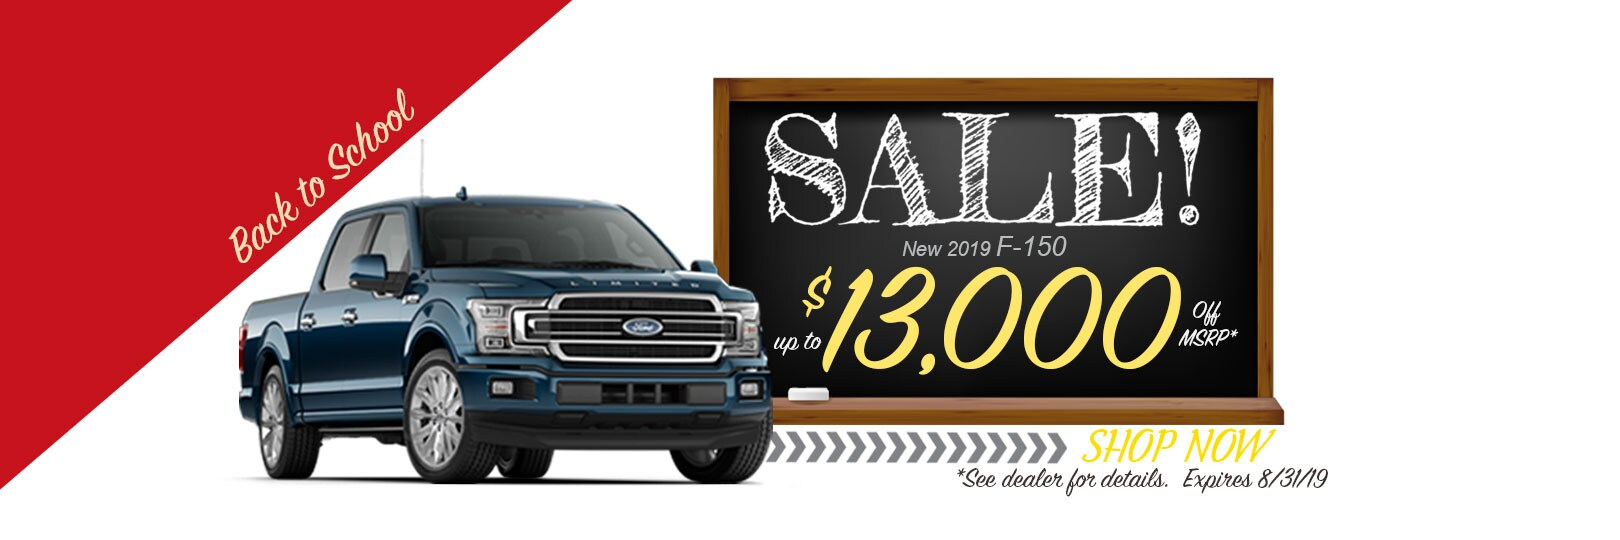 Lewis And Clark Ford >> Lewis And Clark Ford Lincoln Inc Ford Dealership In Yankton Sd